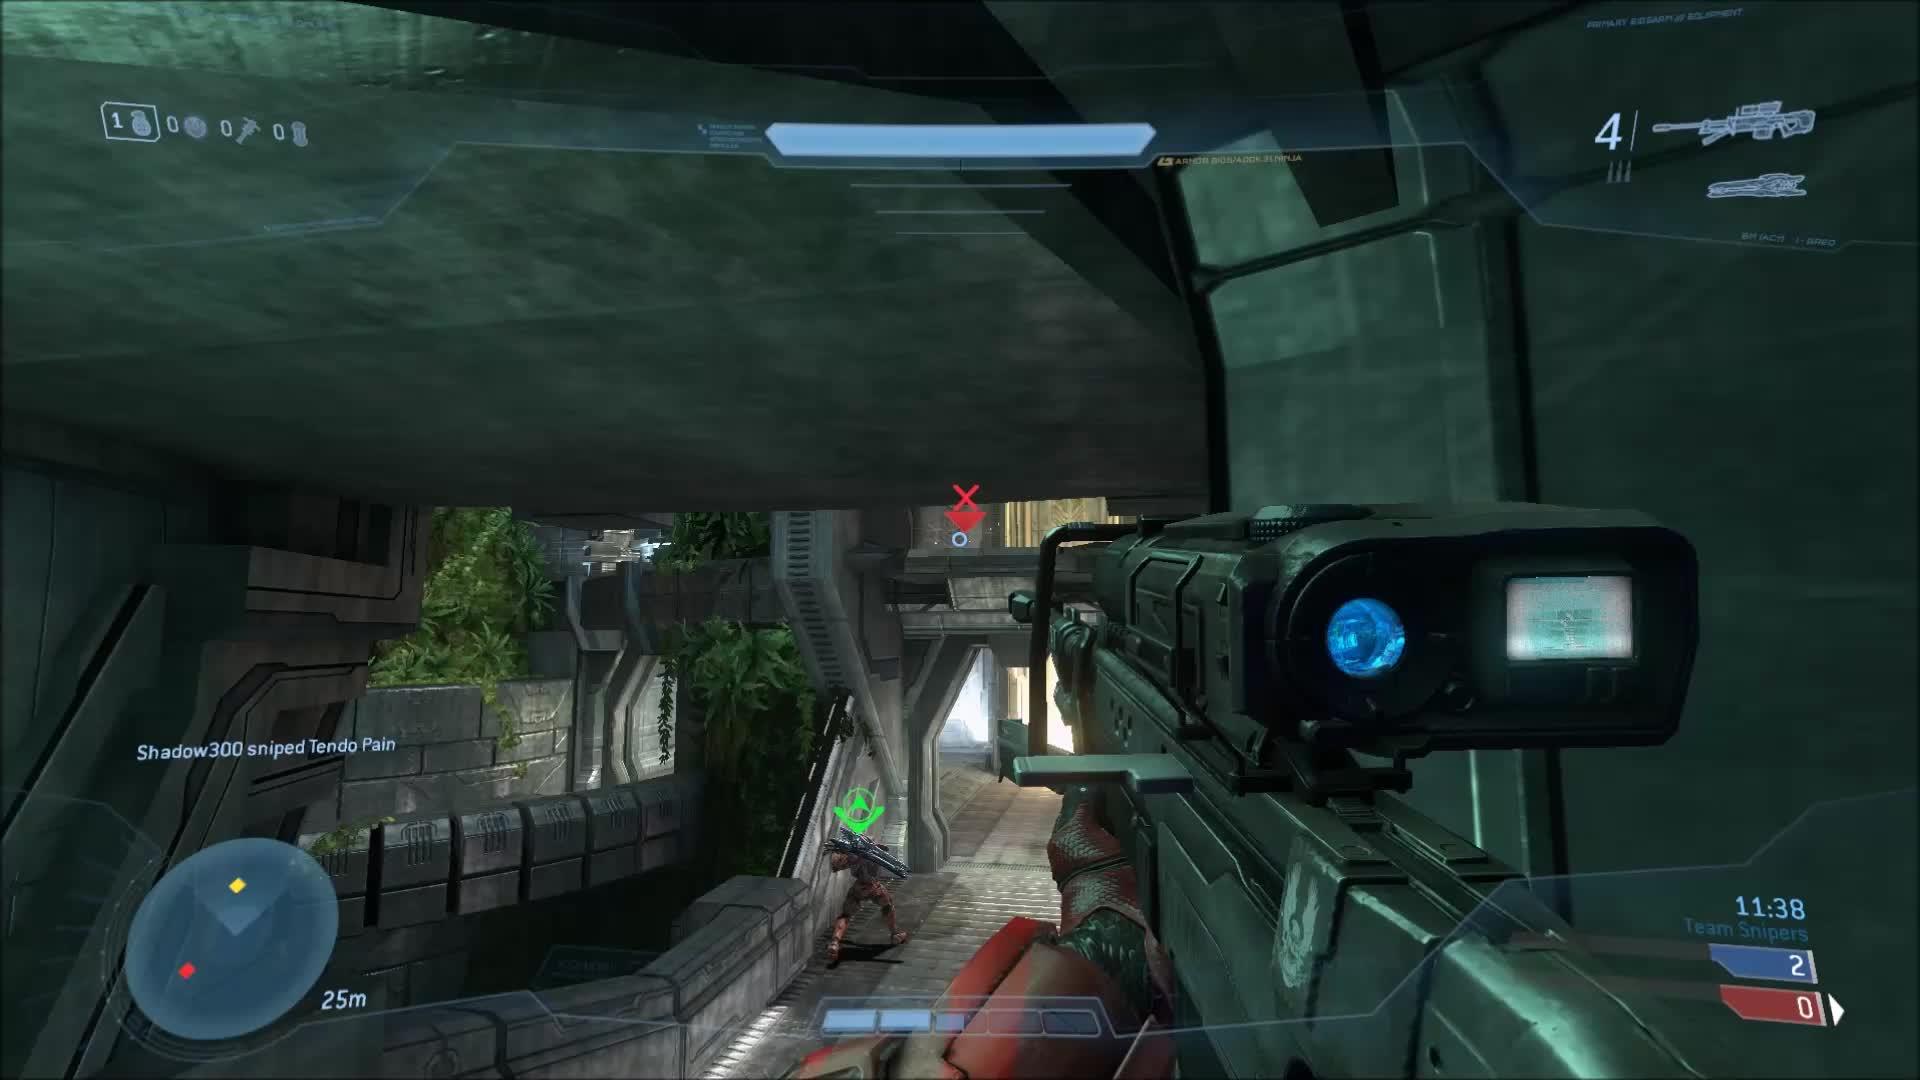 60fpsgifs, Halo, HaloOnline, Clean Noscope Overkill Extermination. GIFs